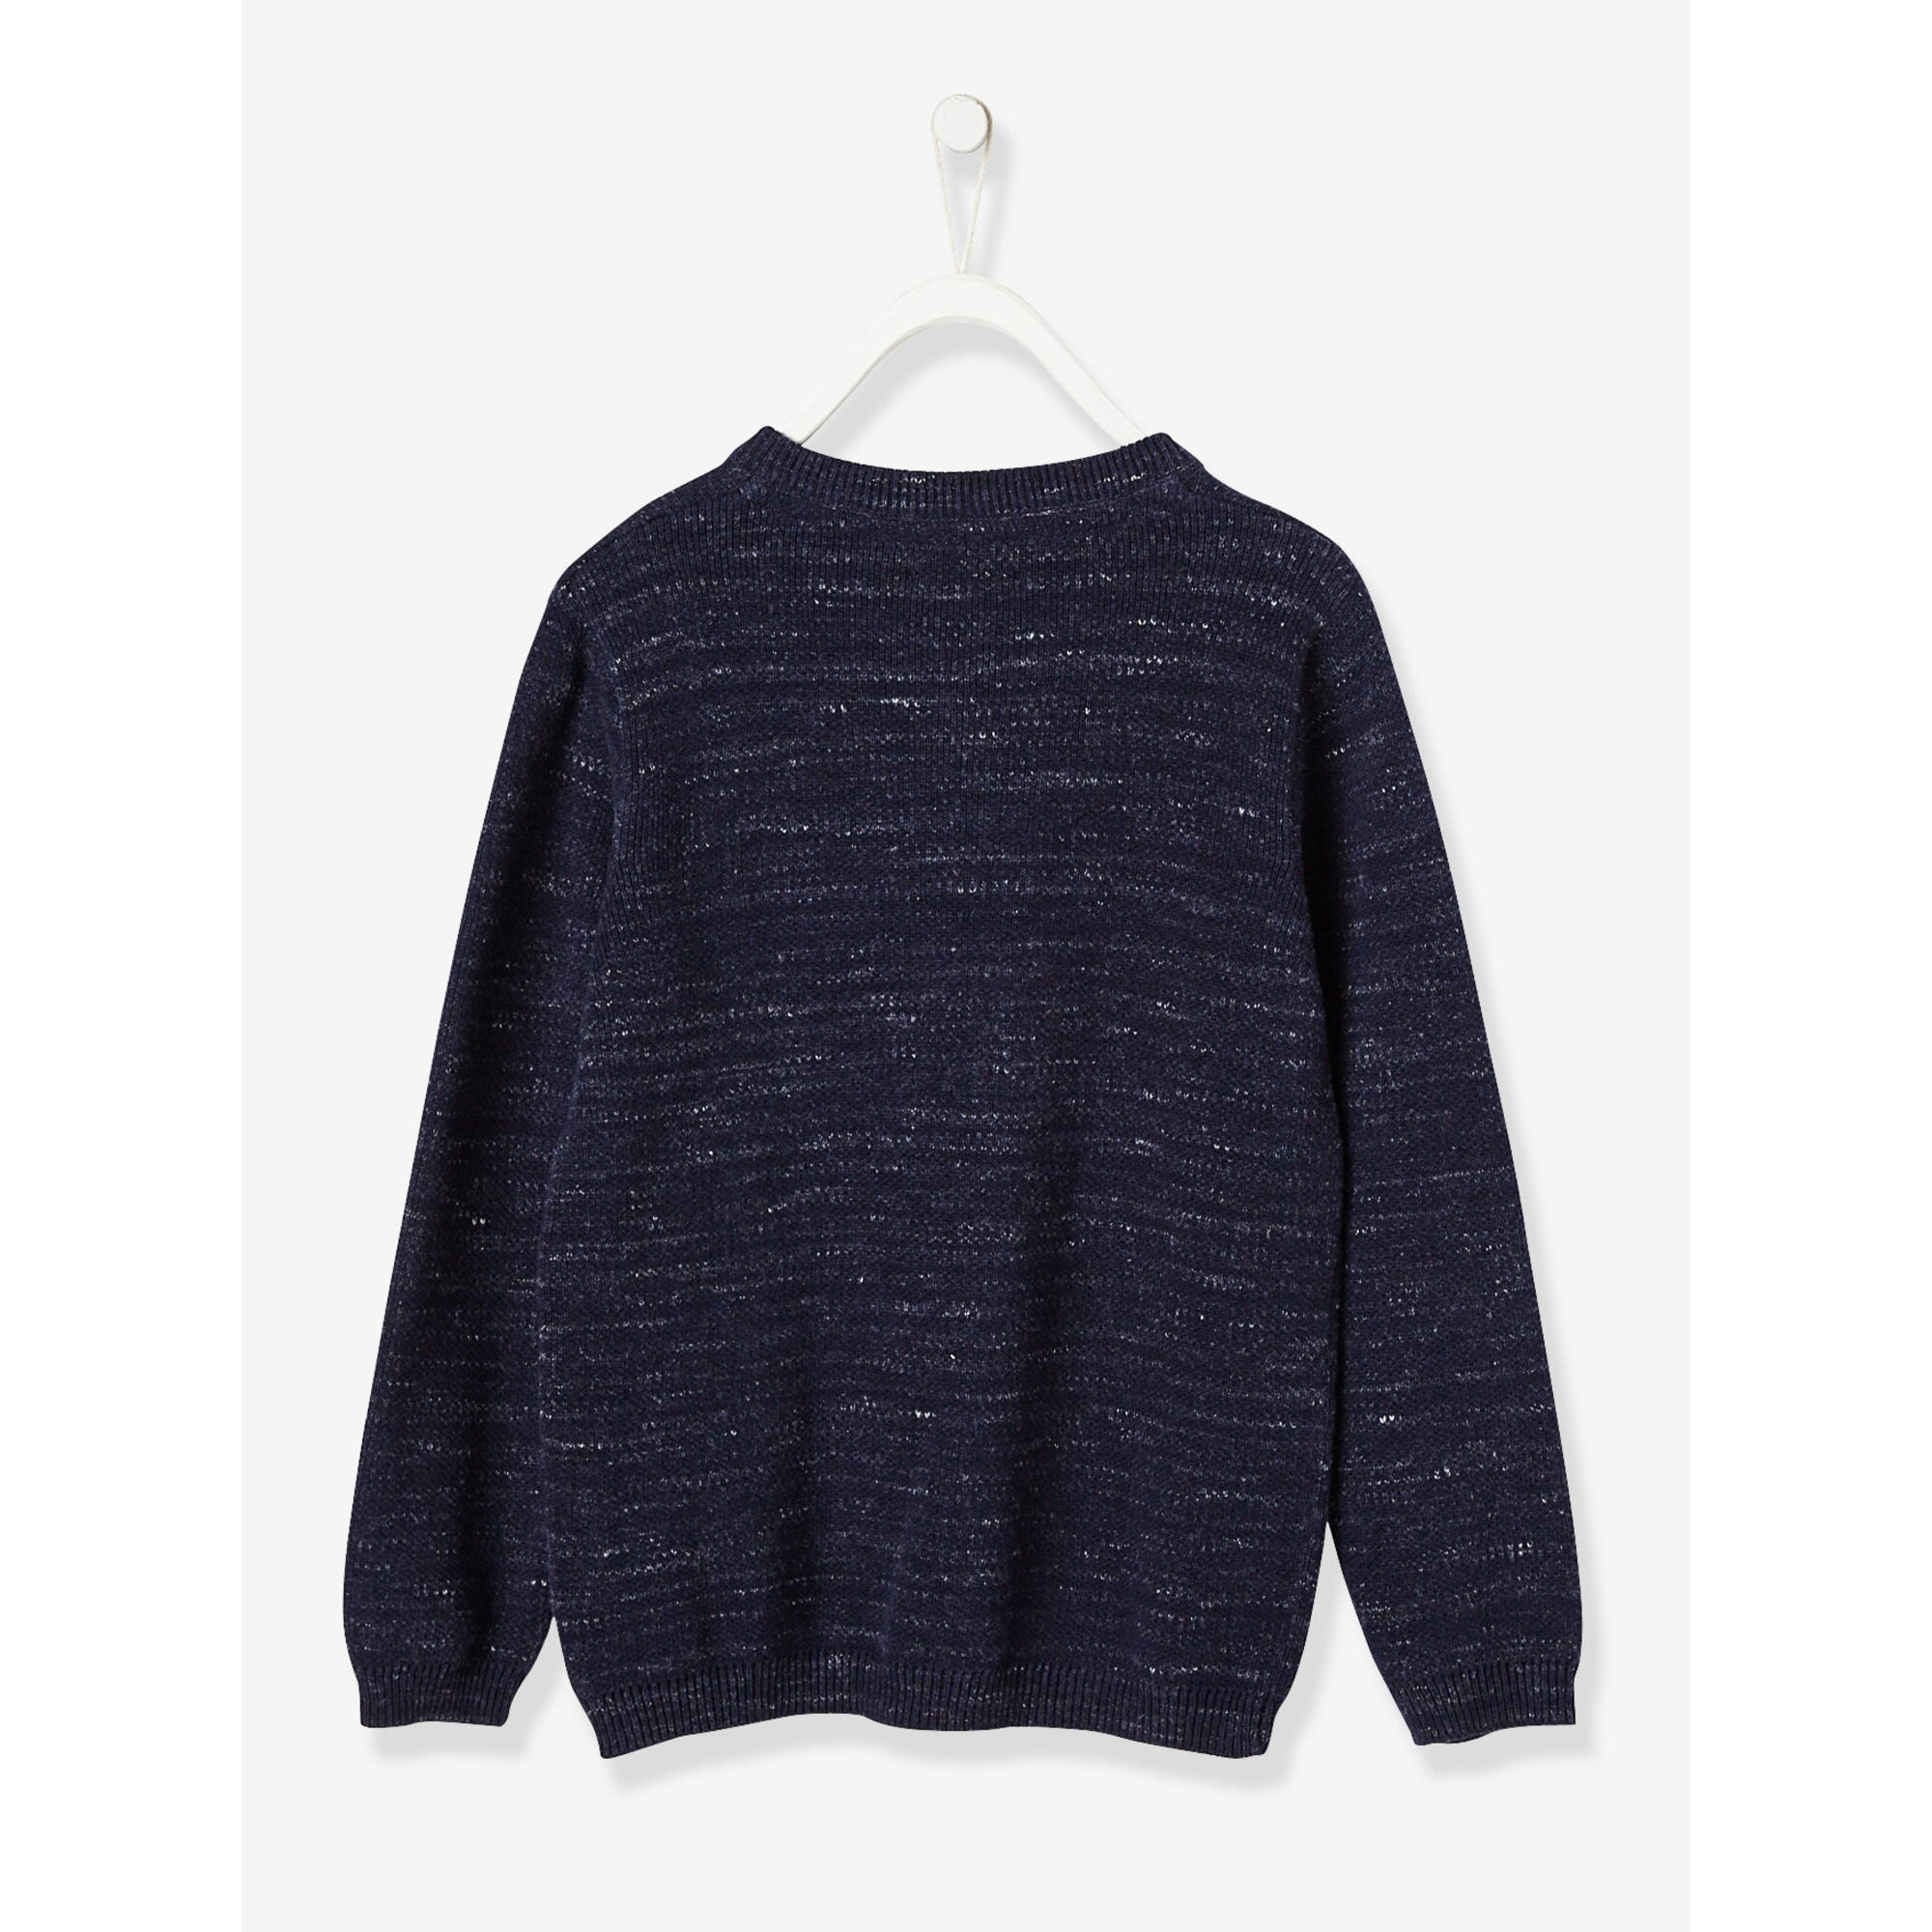 vertbaudet-jungen-henley-pullover-baumwolle, 23.99 EUR @ babywalz-de